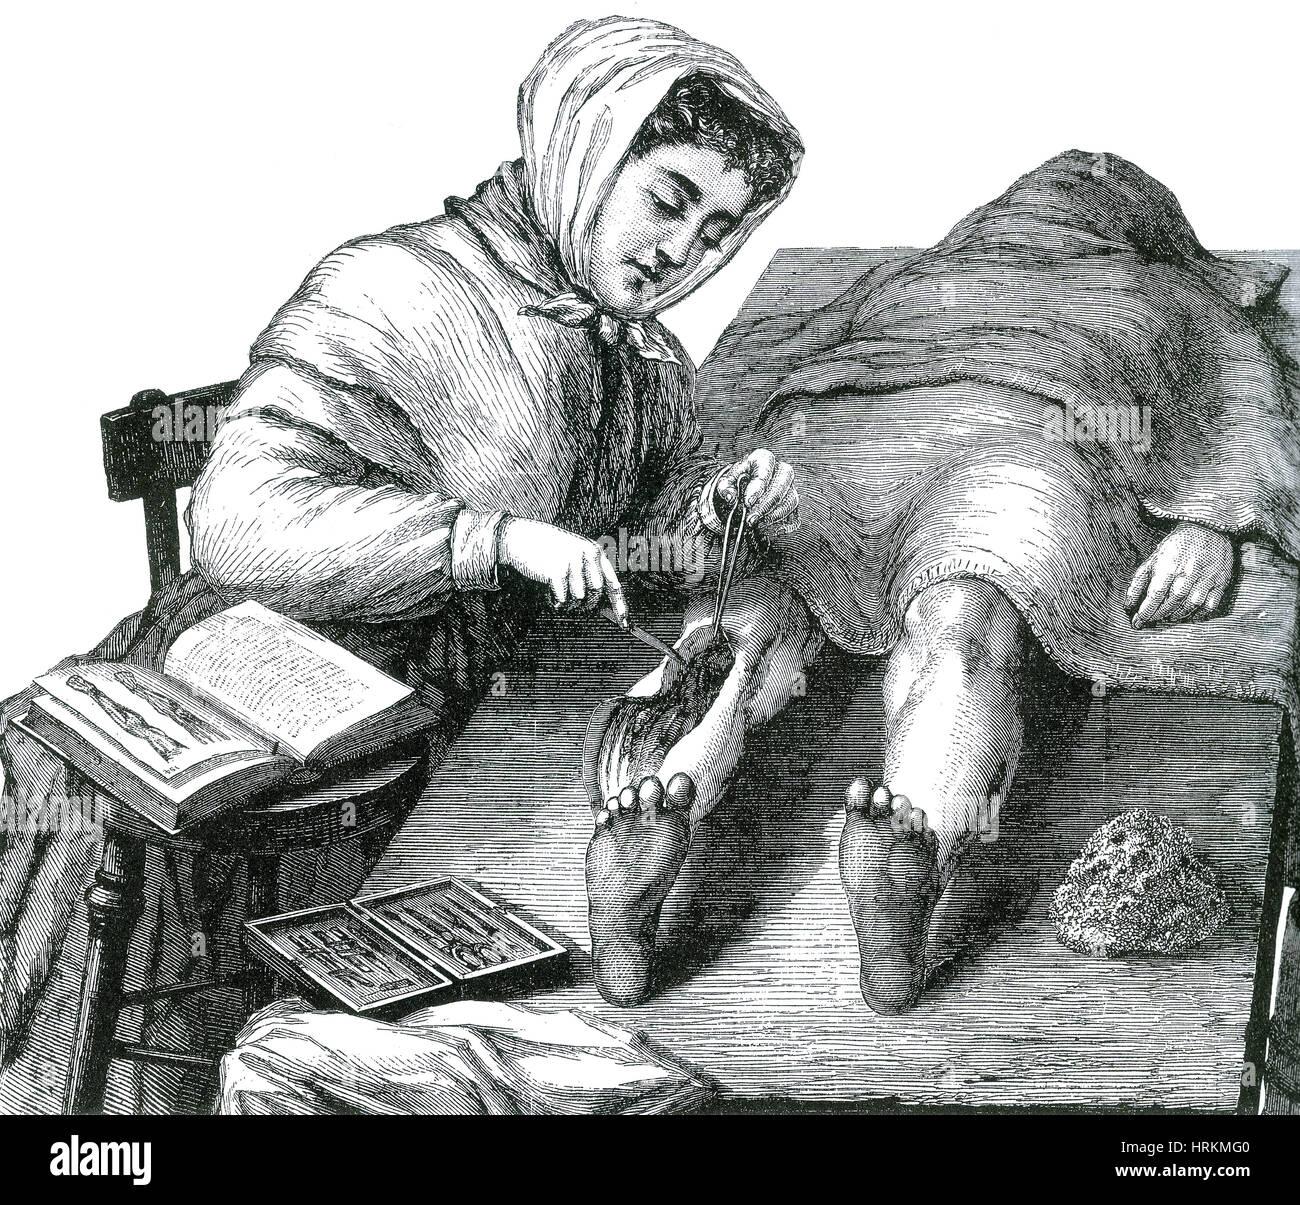 Anatomy Lesson 19th Century Stock Photos & Anatomy Lesson 19th ...